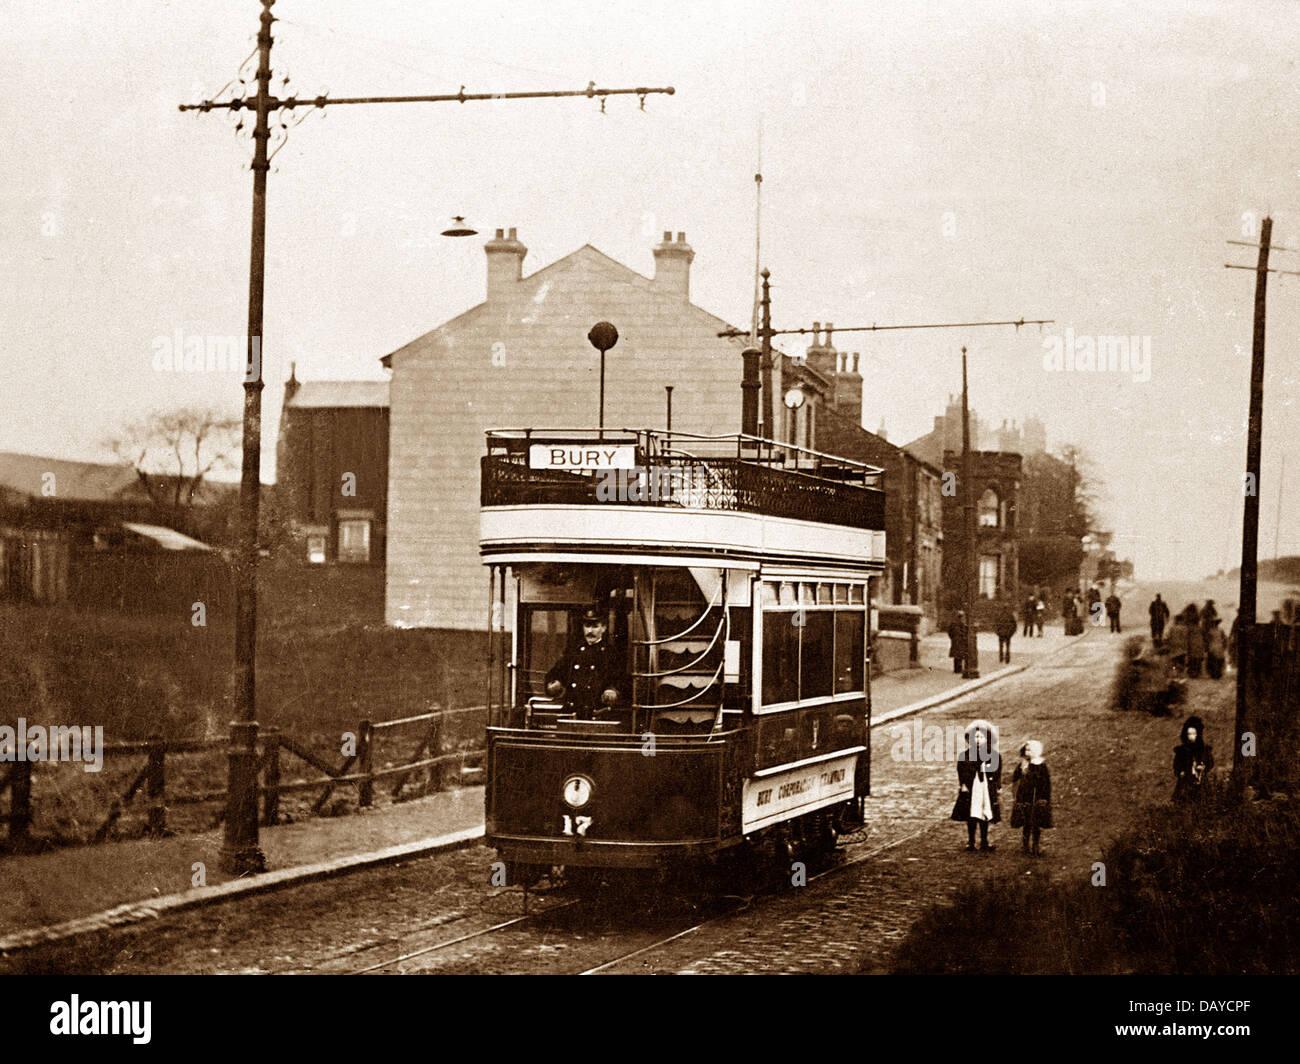 Bury Jericho early 1900s - Stock Image